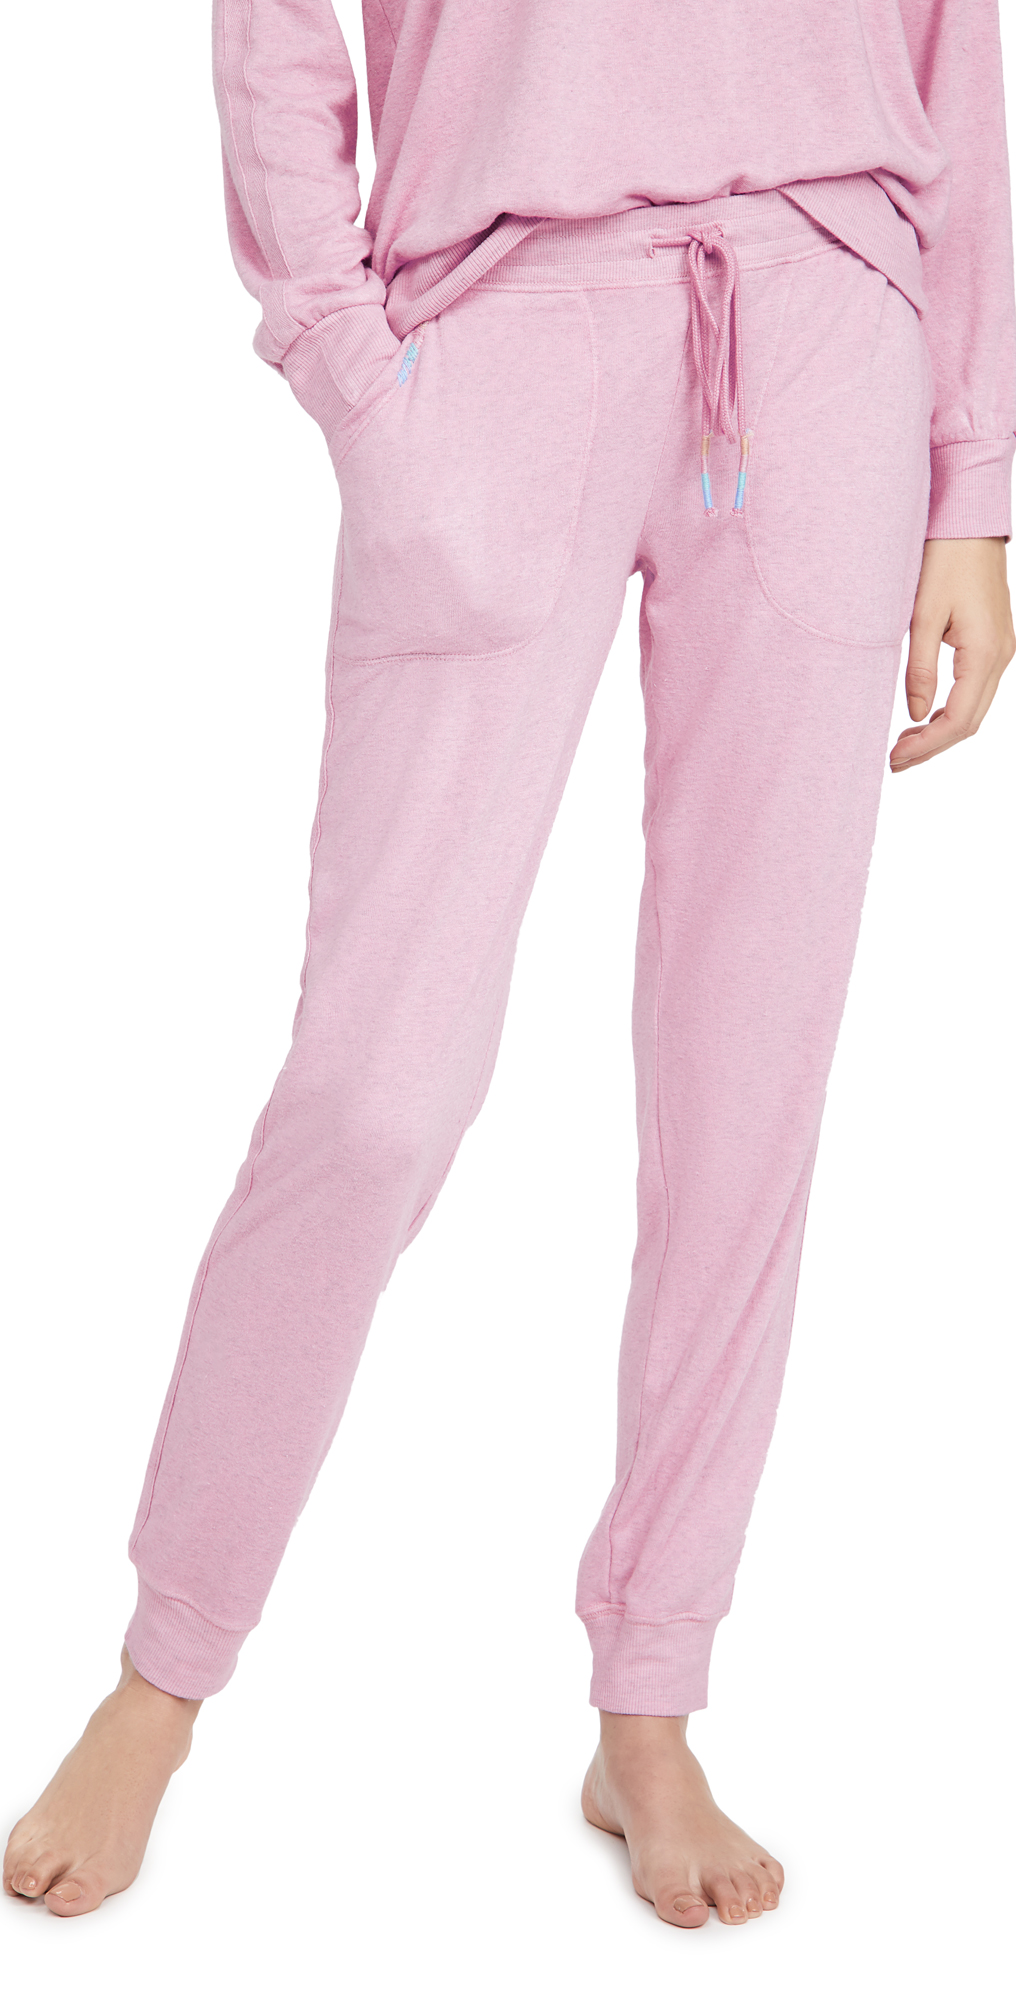 PJ Salvage Colorful Classic Jam Pants